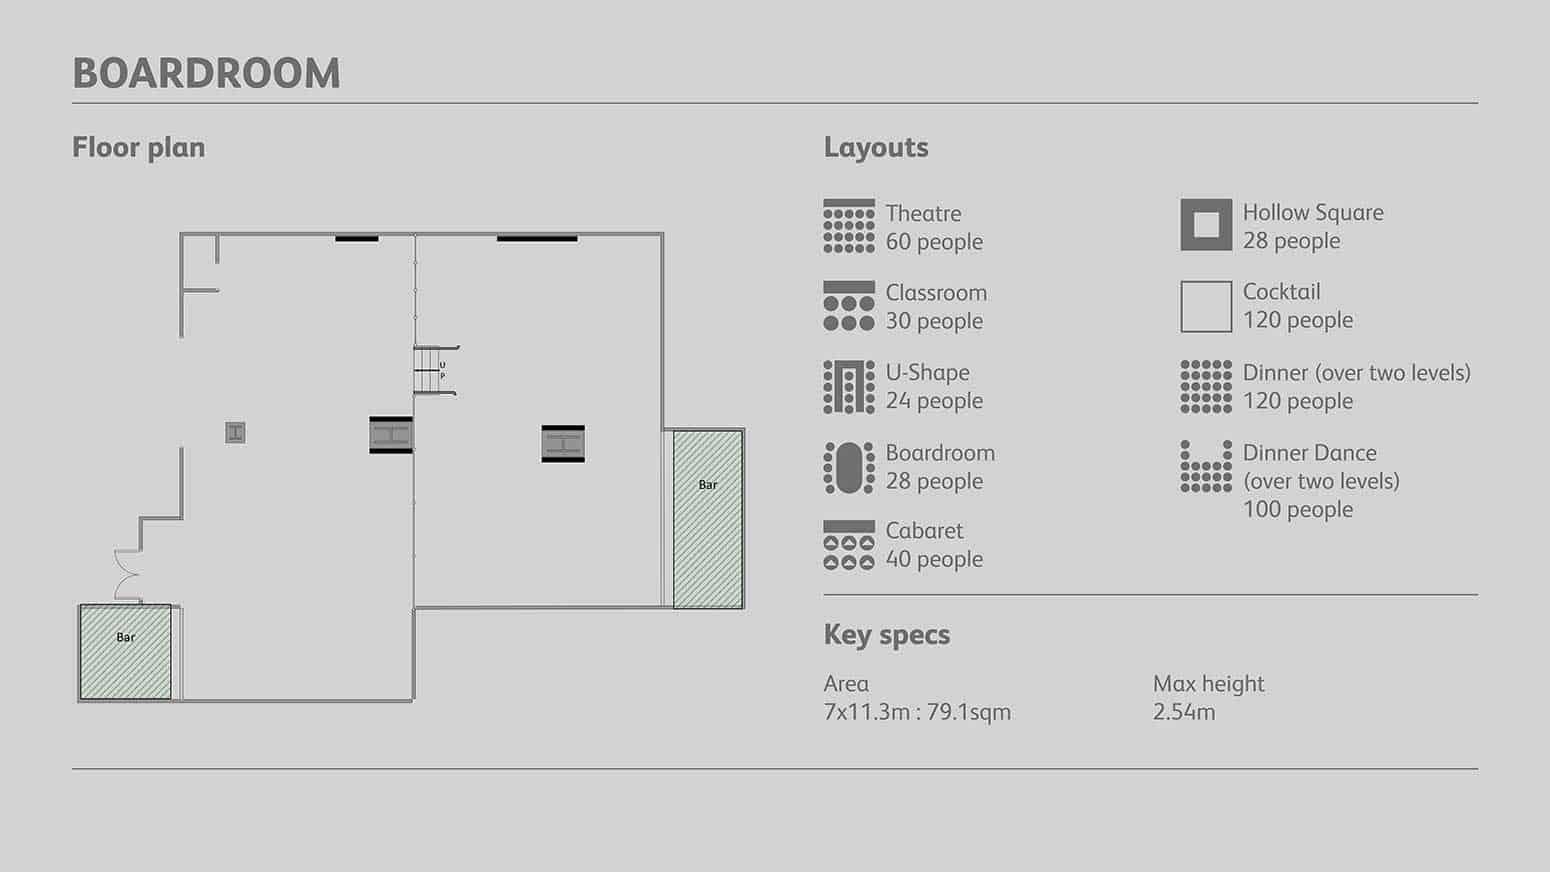 Boardroom floorplan